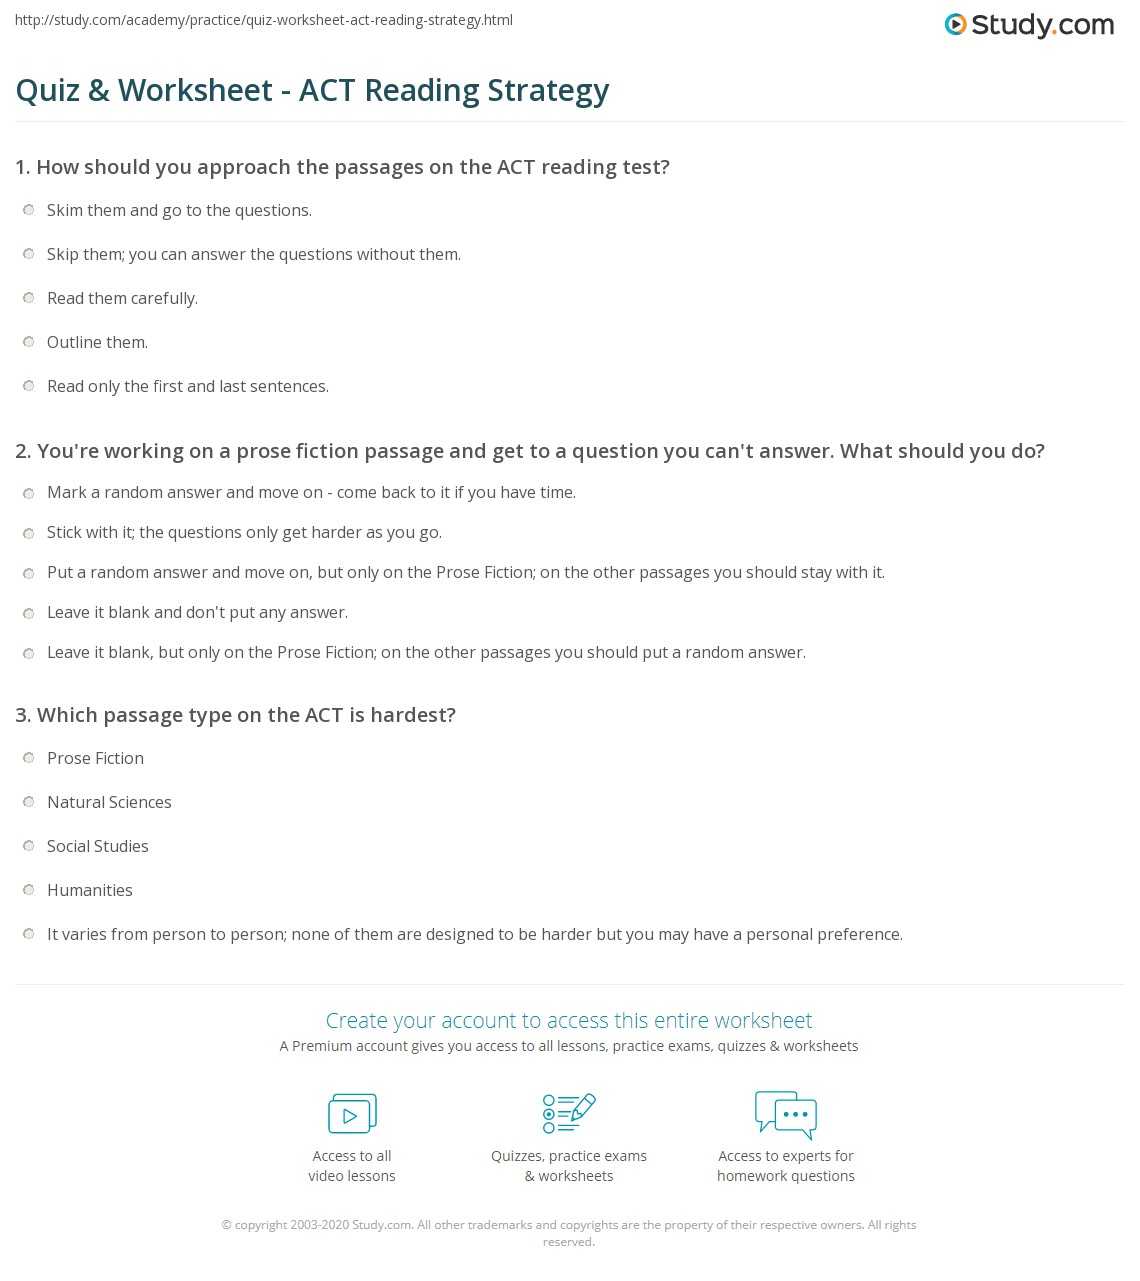 Quiz Worksheet Act Reading Strategy Study Com